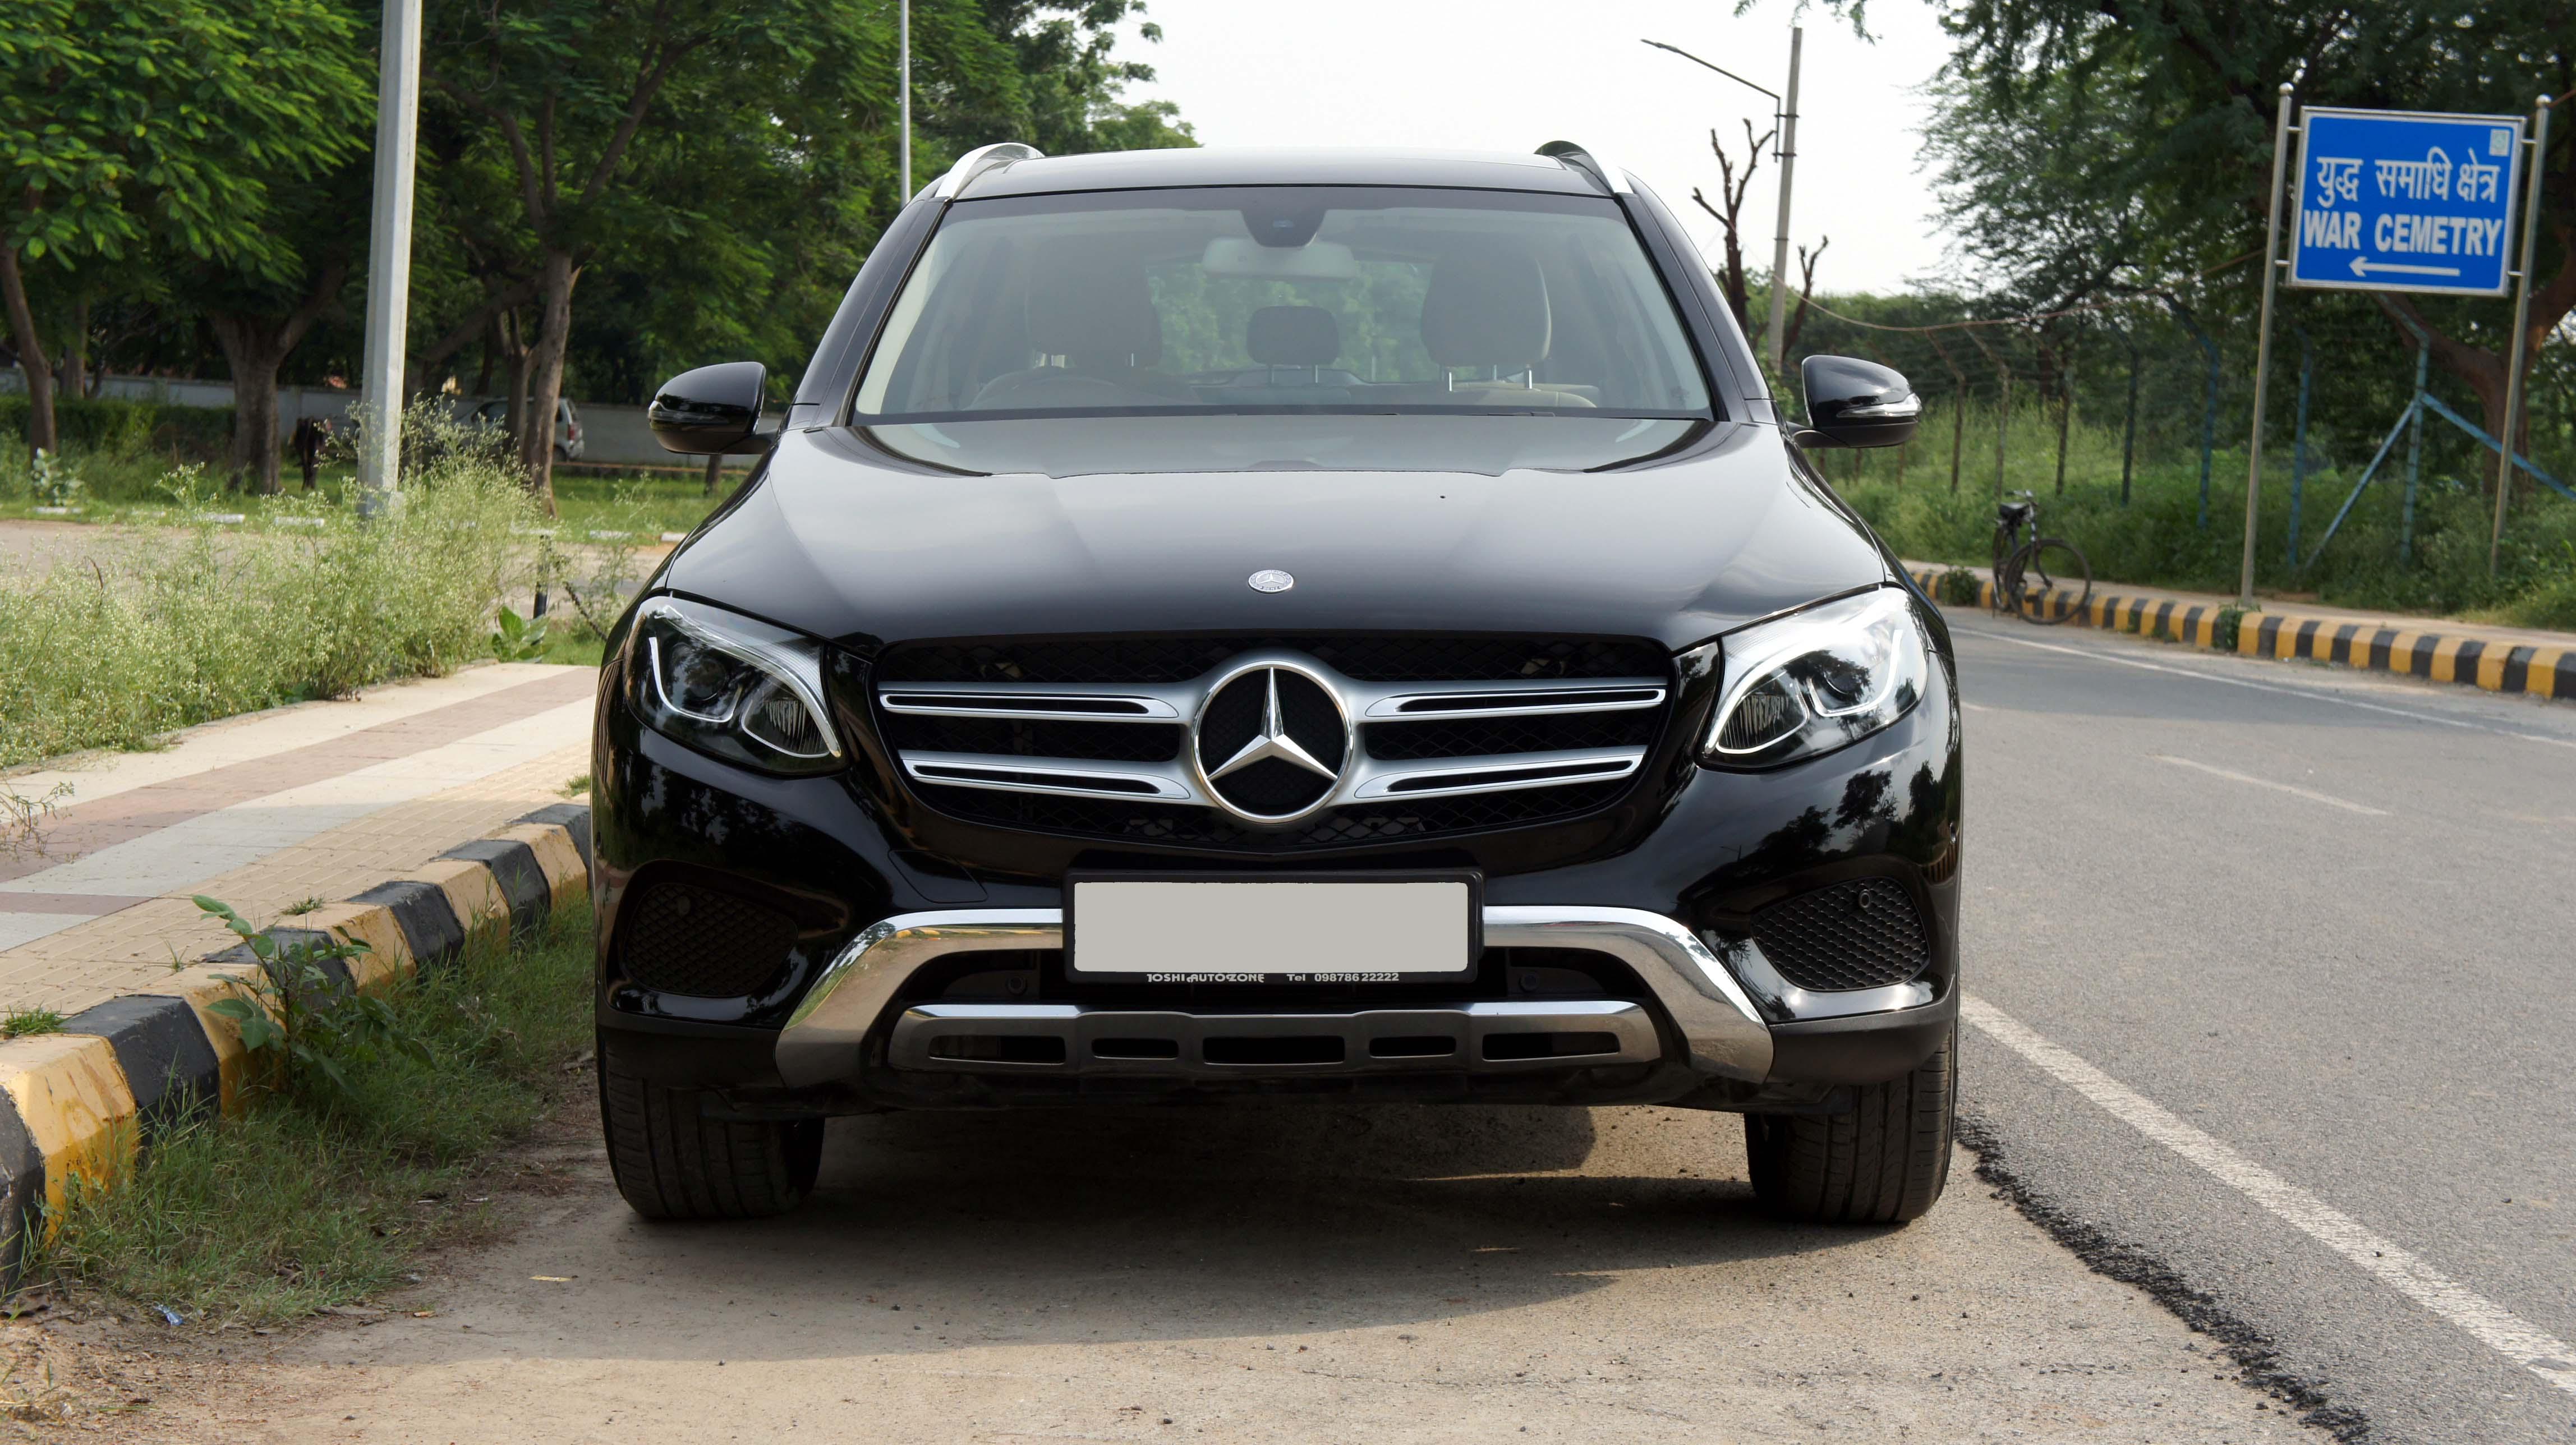 Mercedes-Benz GLC 220D (4-MATIC SPORT)